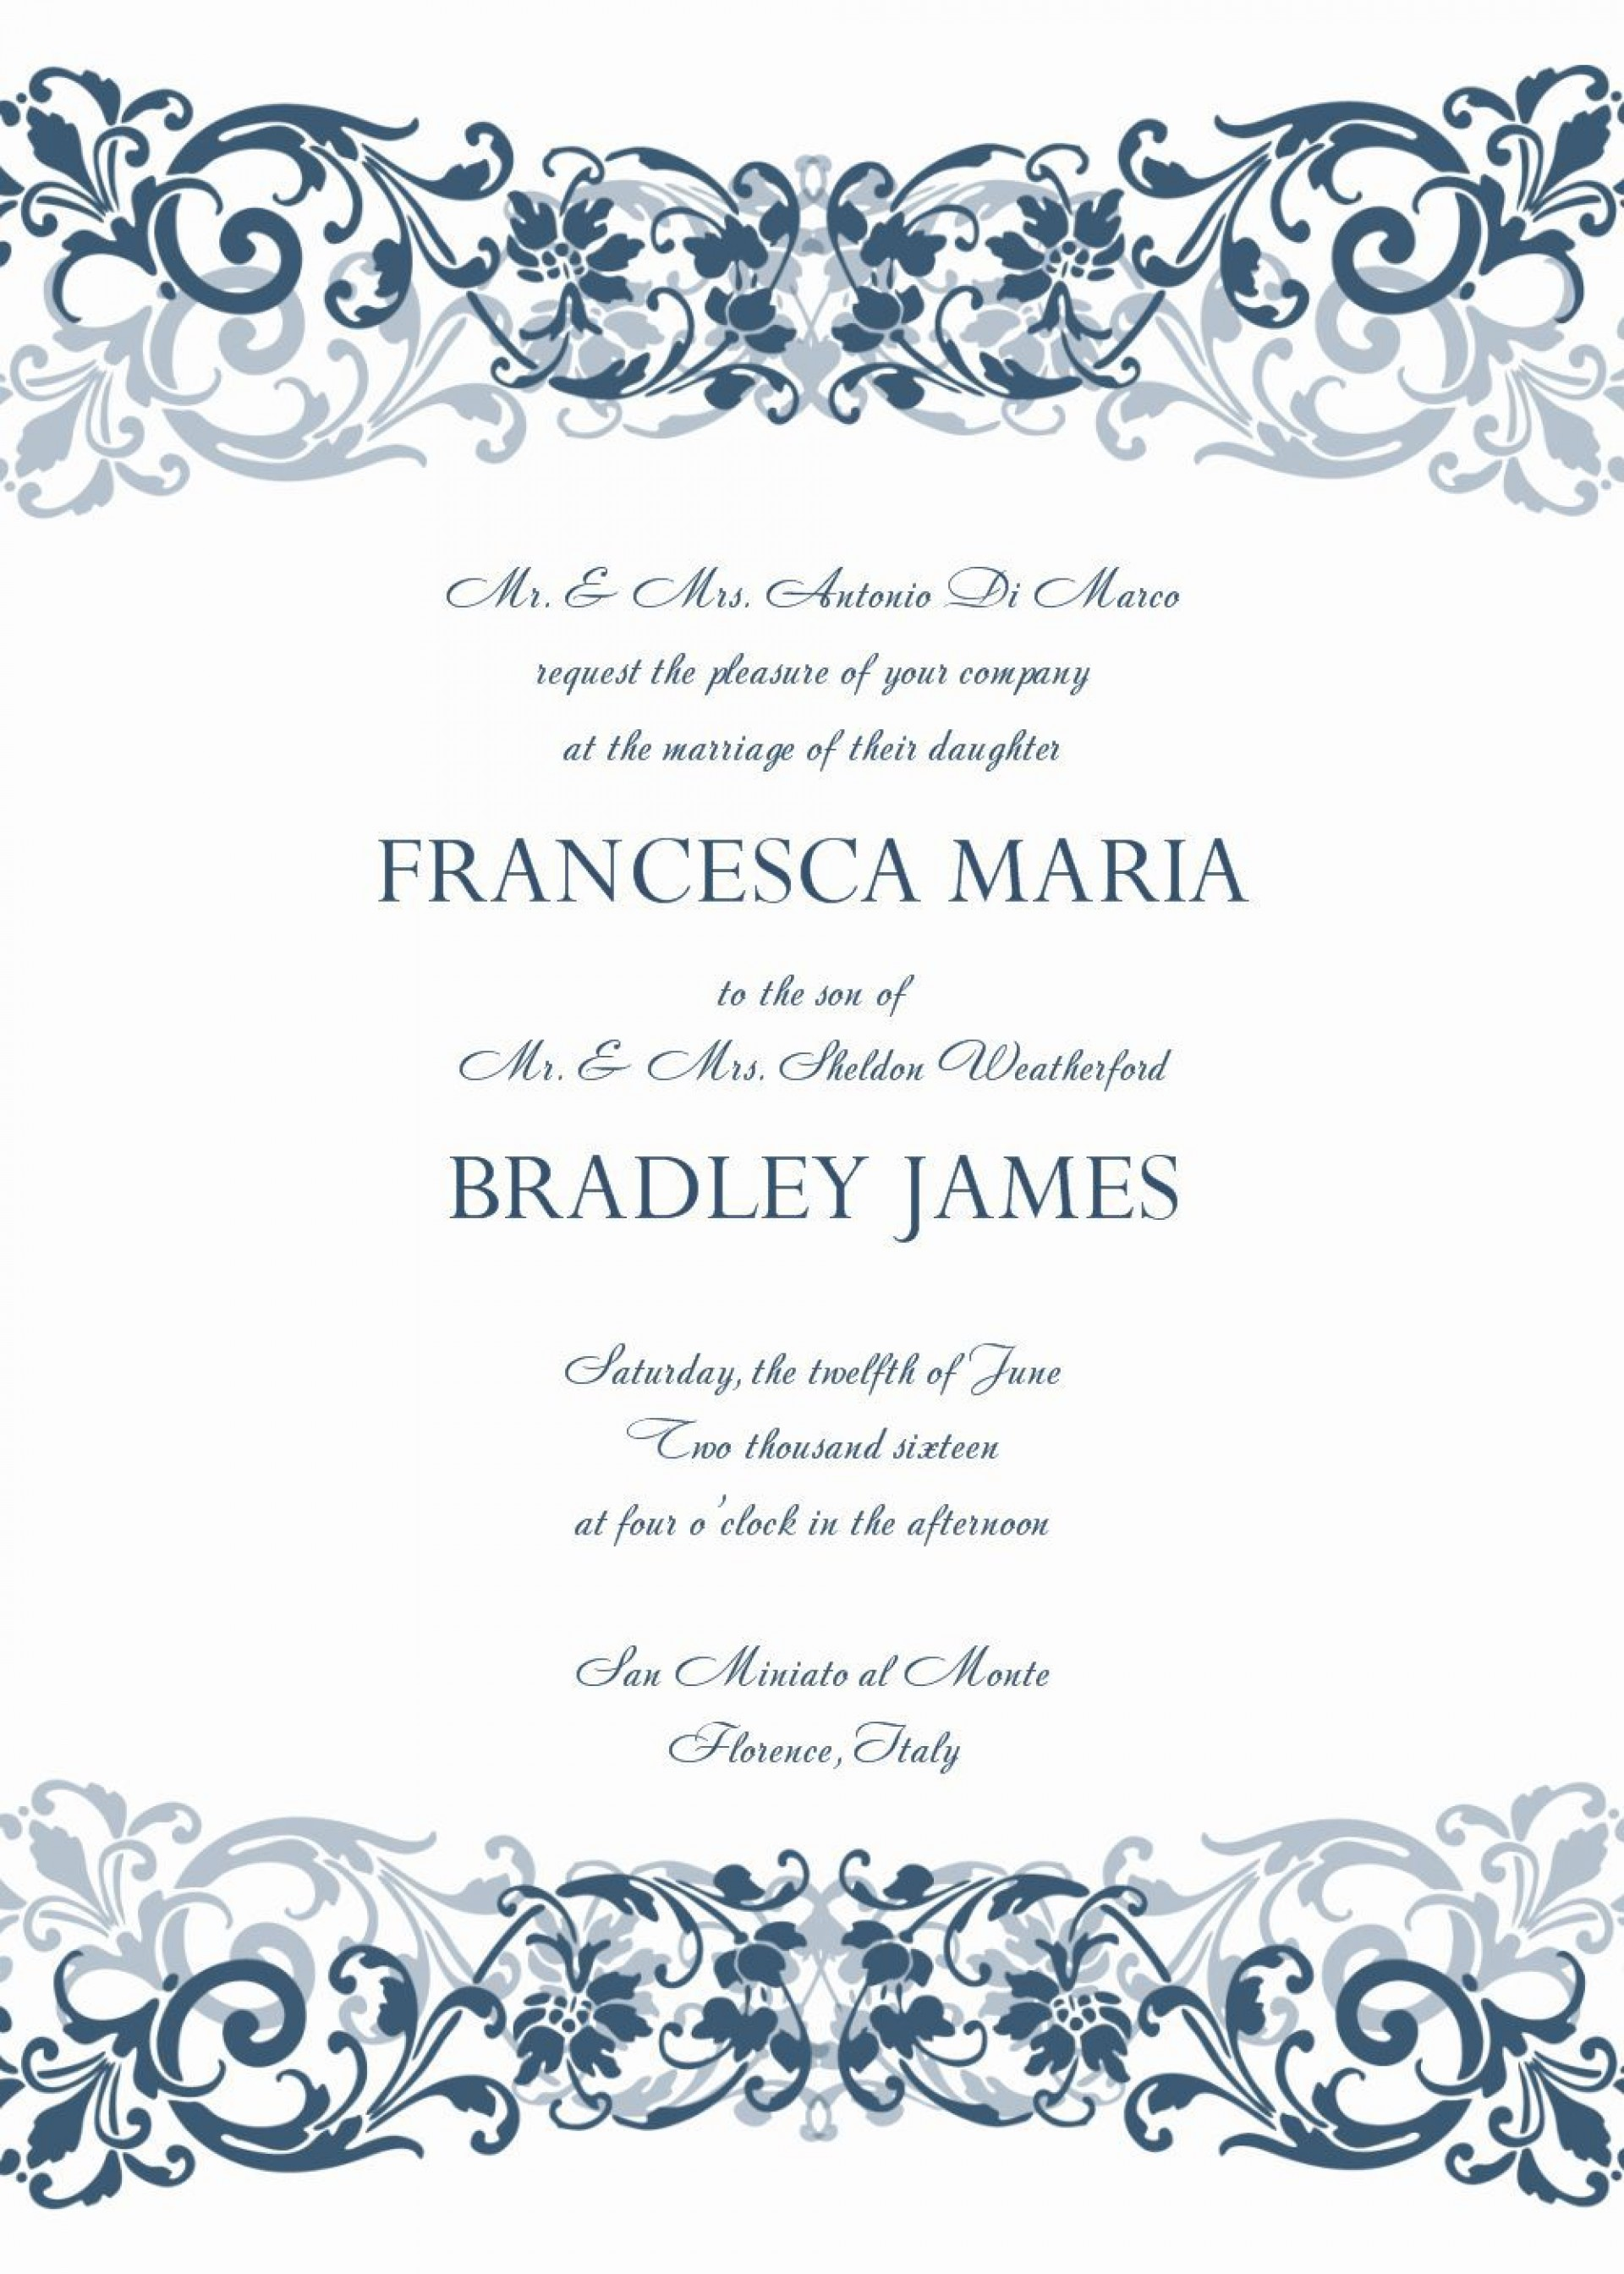 008 Unusual Formal Wedding Invitation Template Free Highest Clarity 1920